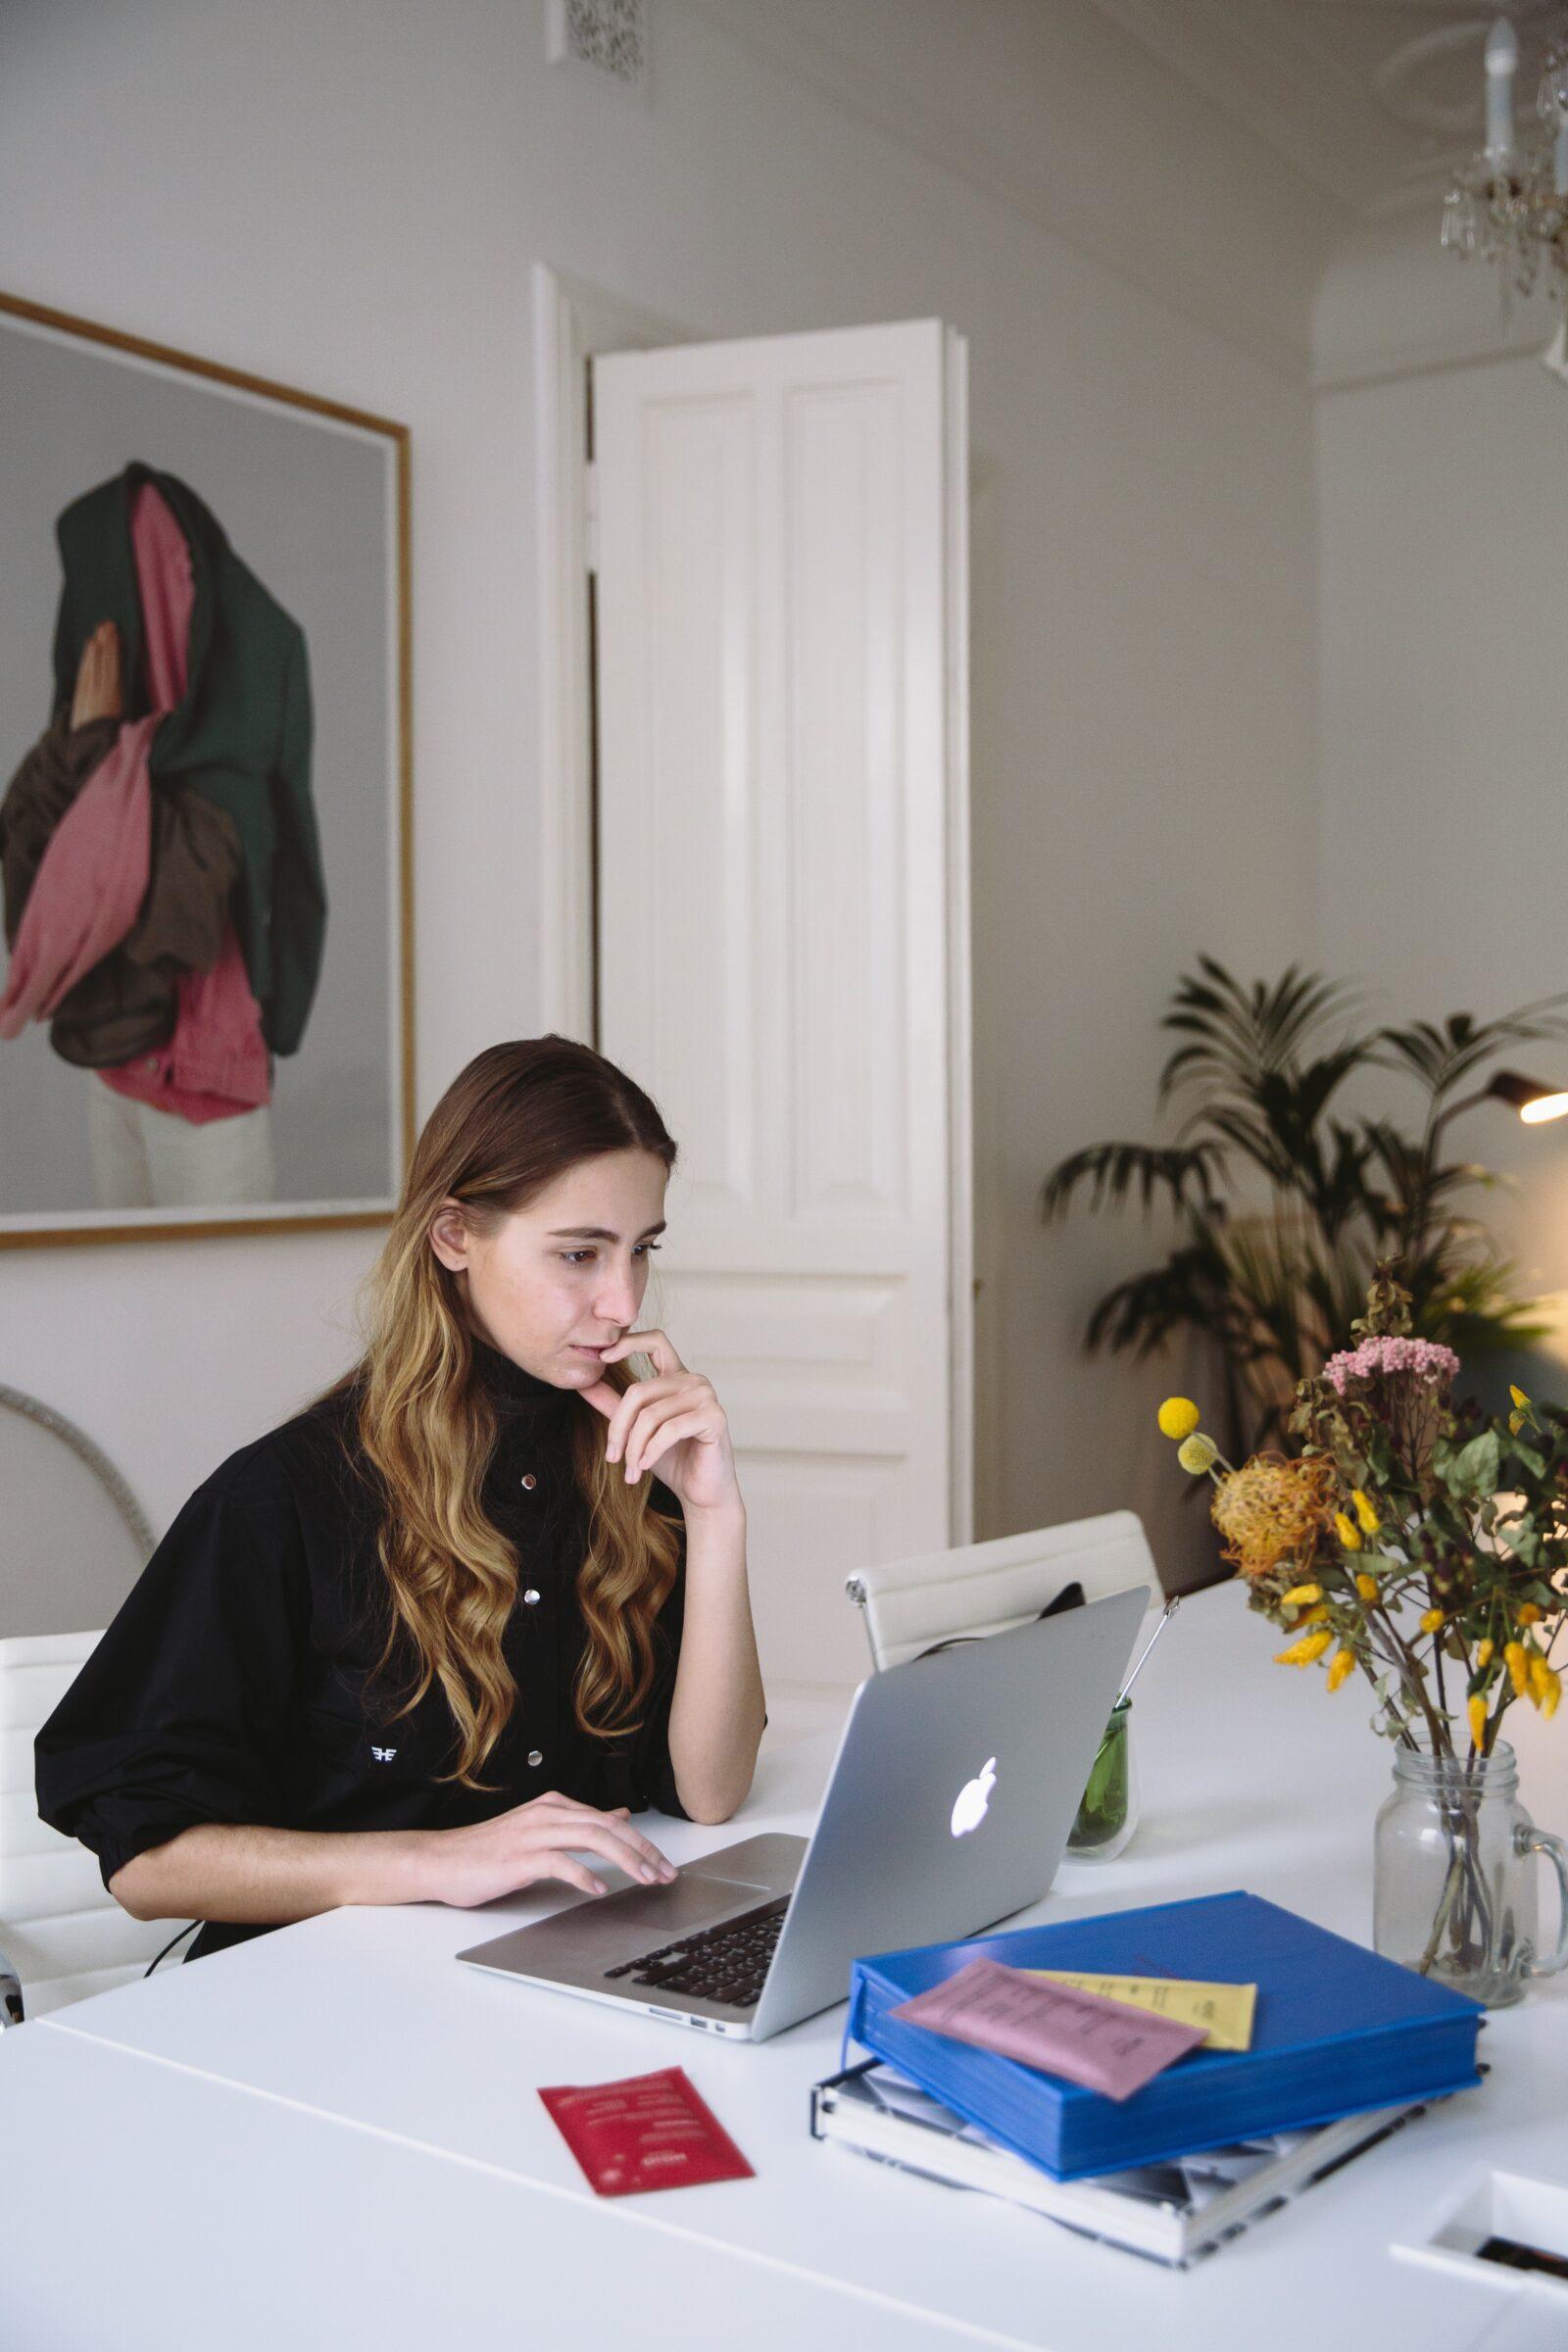 Photo Of Woman Using Laptop 3747446